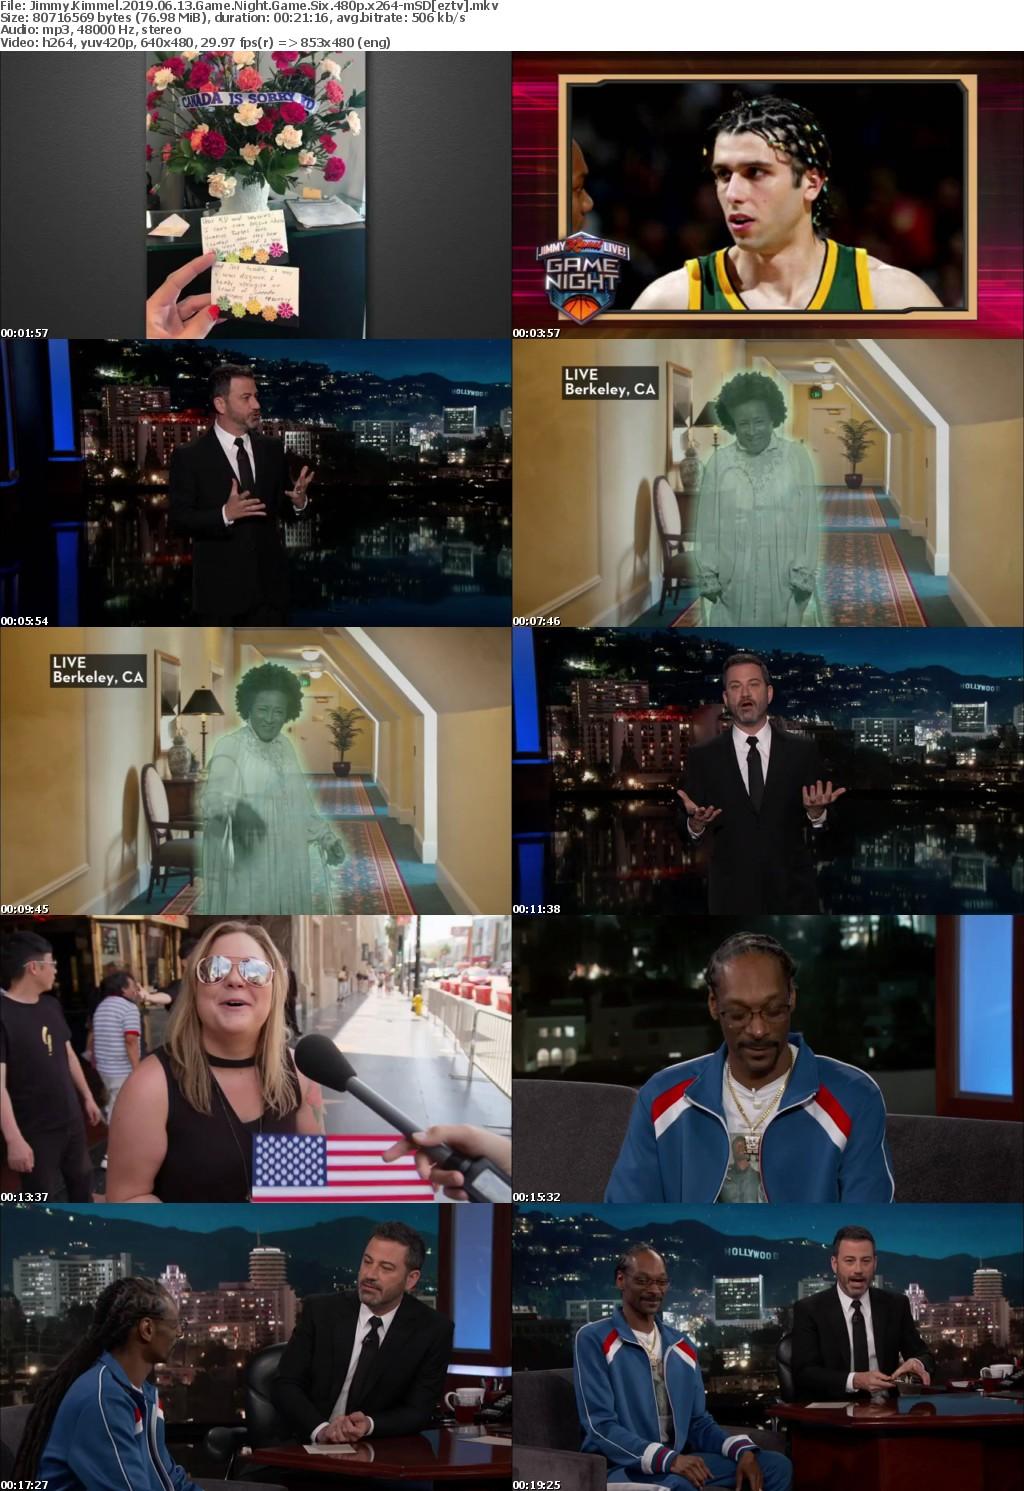 Jimmy Kimmel 2019 06 13 Game Night Game Six 480p x264-mSD